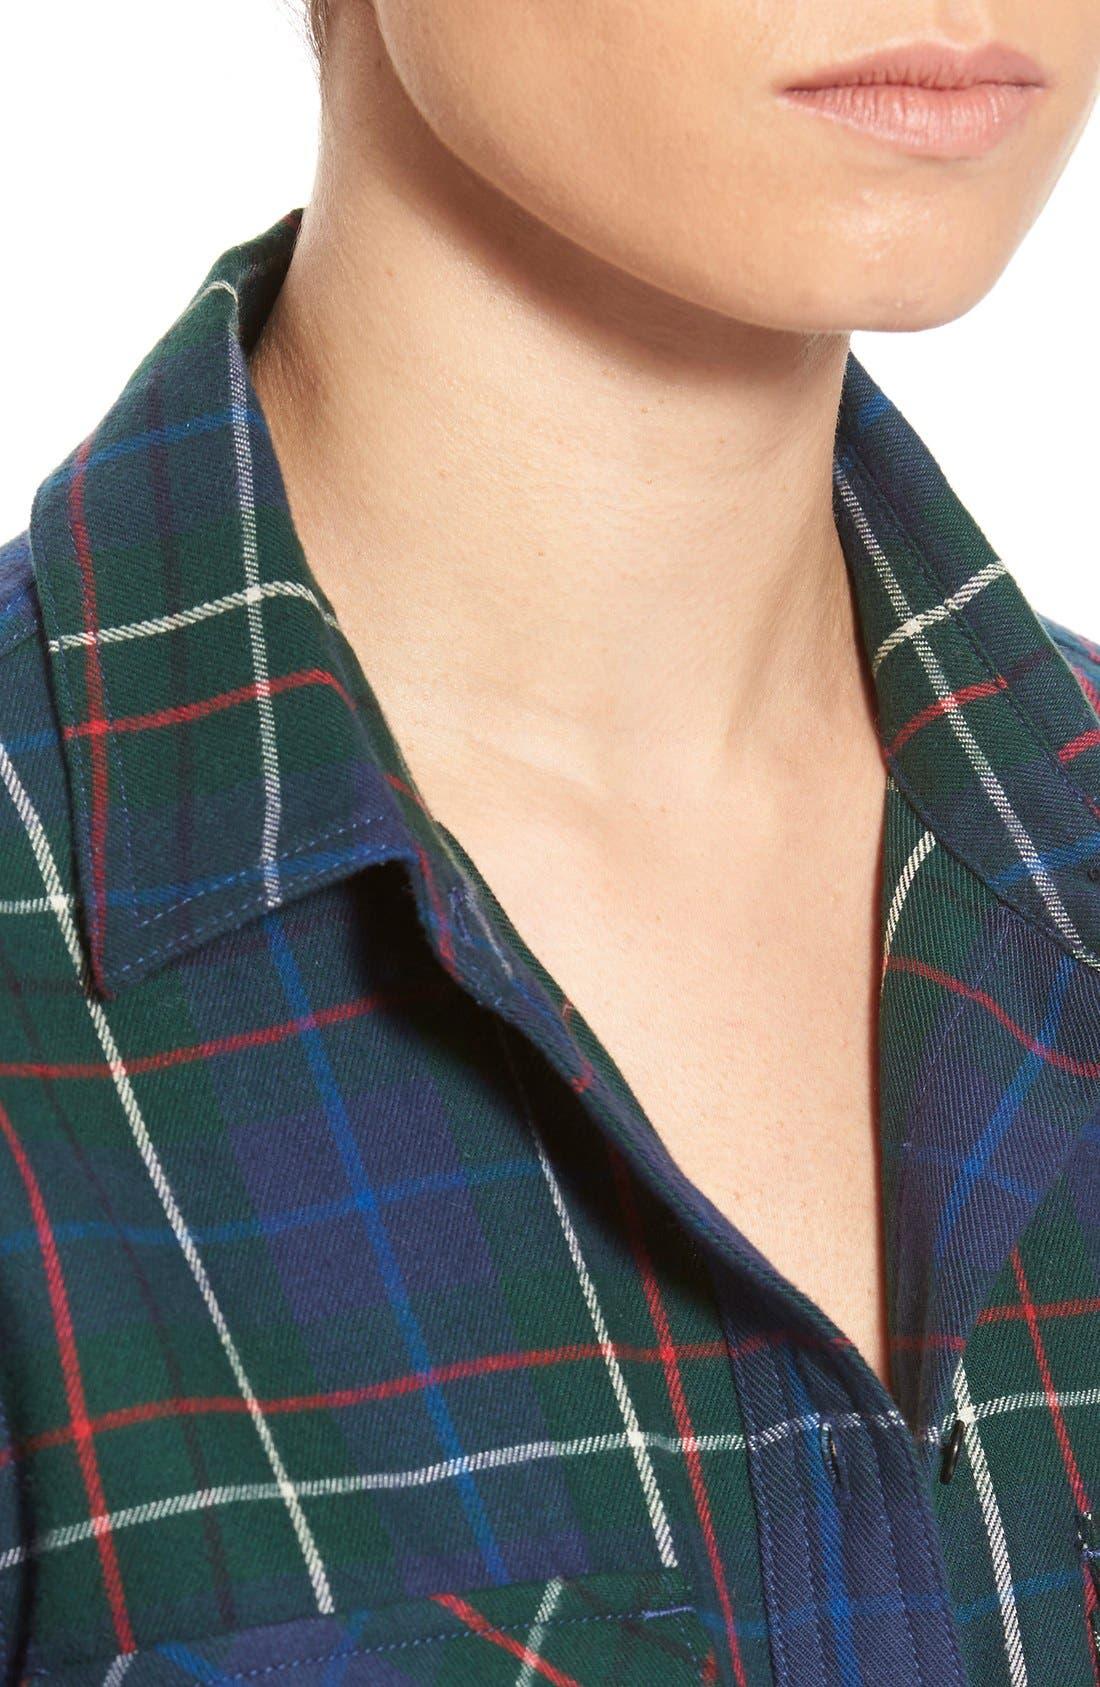 Ex Boyfriend - Ontario Plaid Flannel Shirt,                             Alternate thumbnail 4, color,                             300